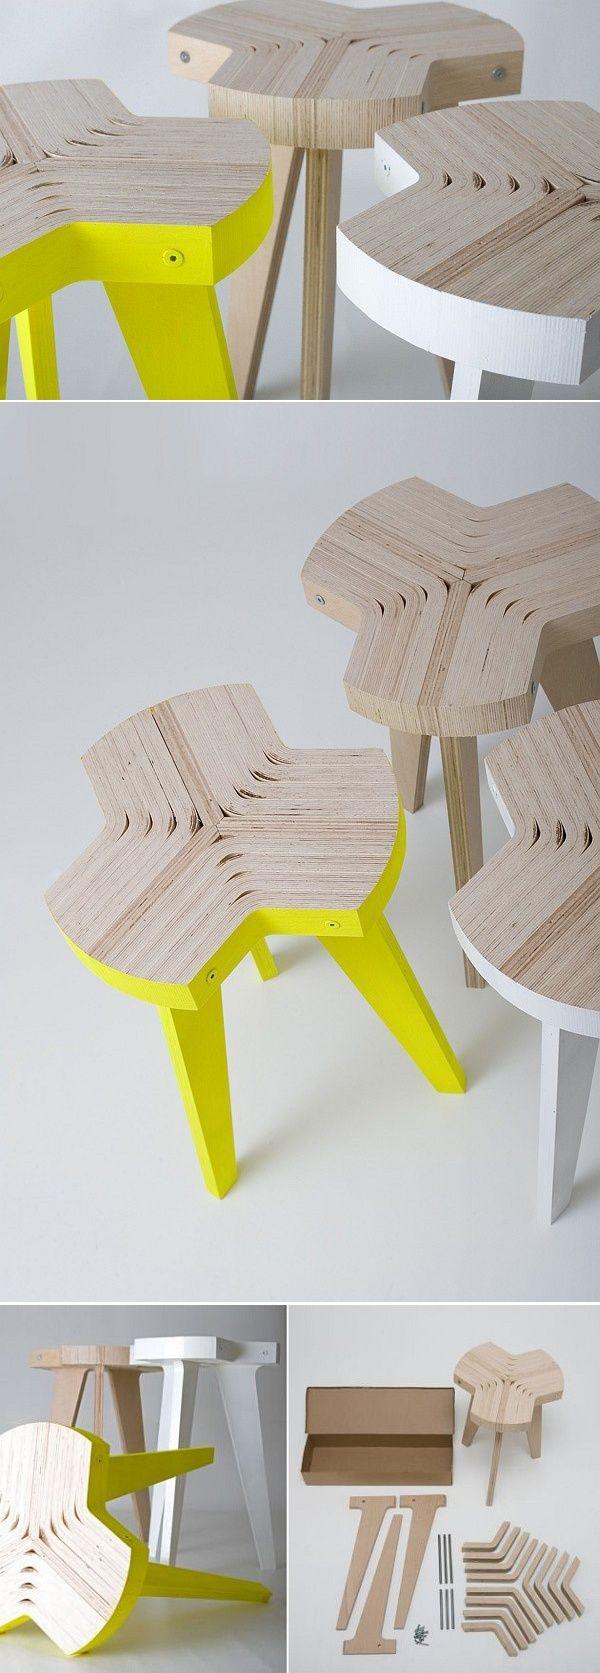 best niceideas images on pinterest product design good ideas